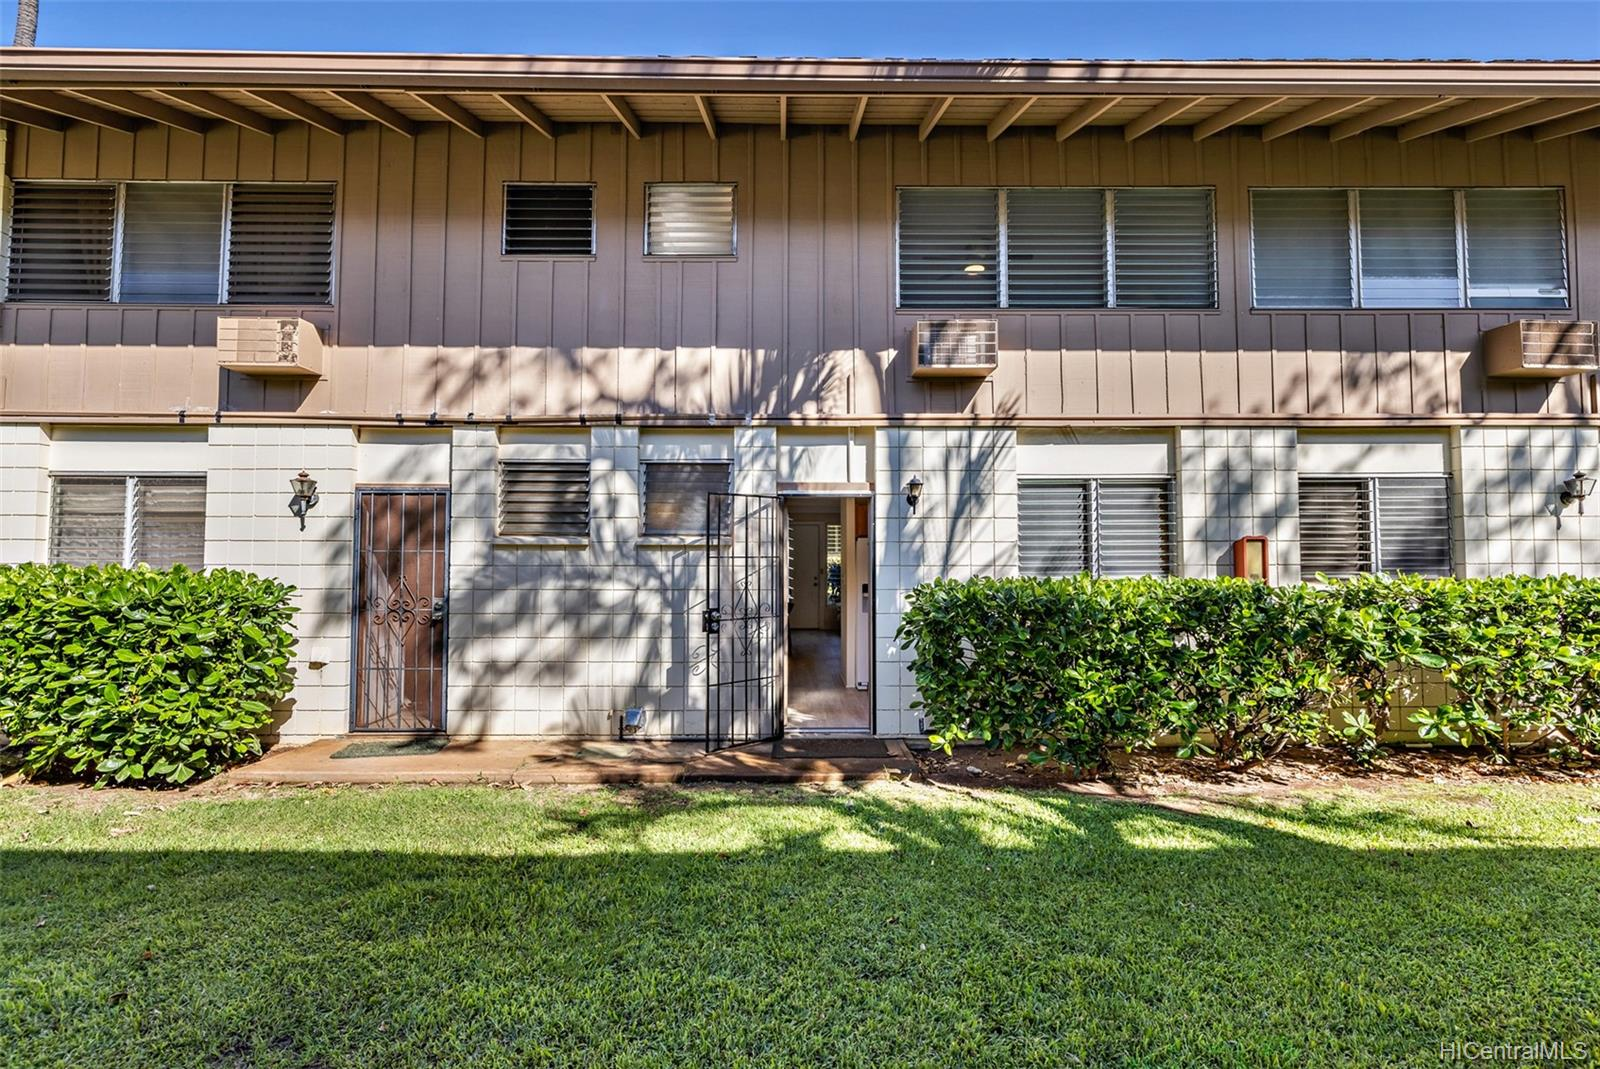 4188-3 Keanu Street townhouse # 130, Honolulu, Hawaii - photo 15 of 23